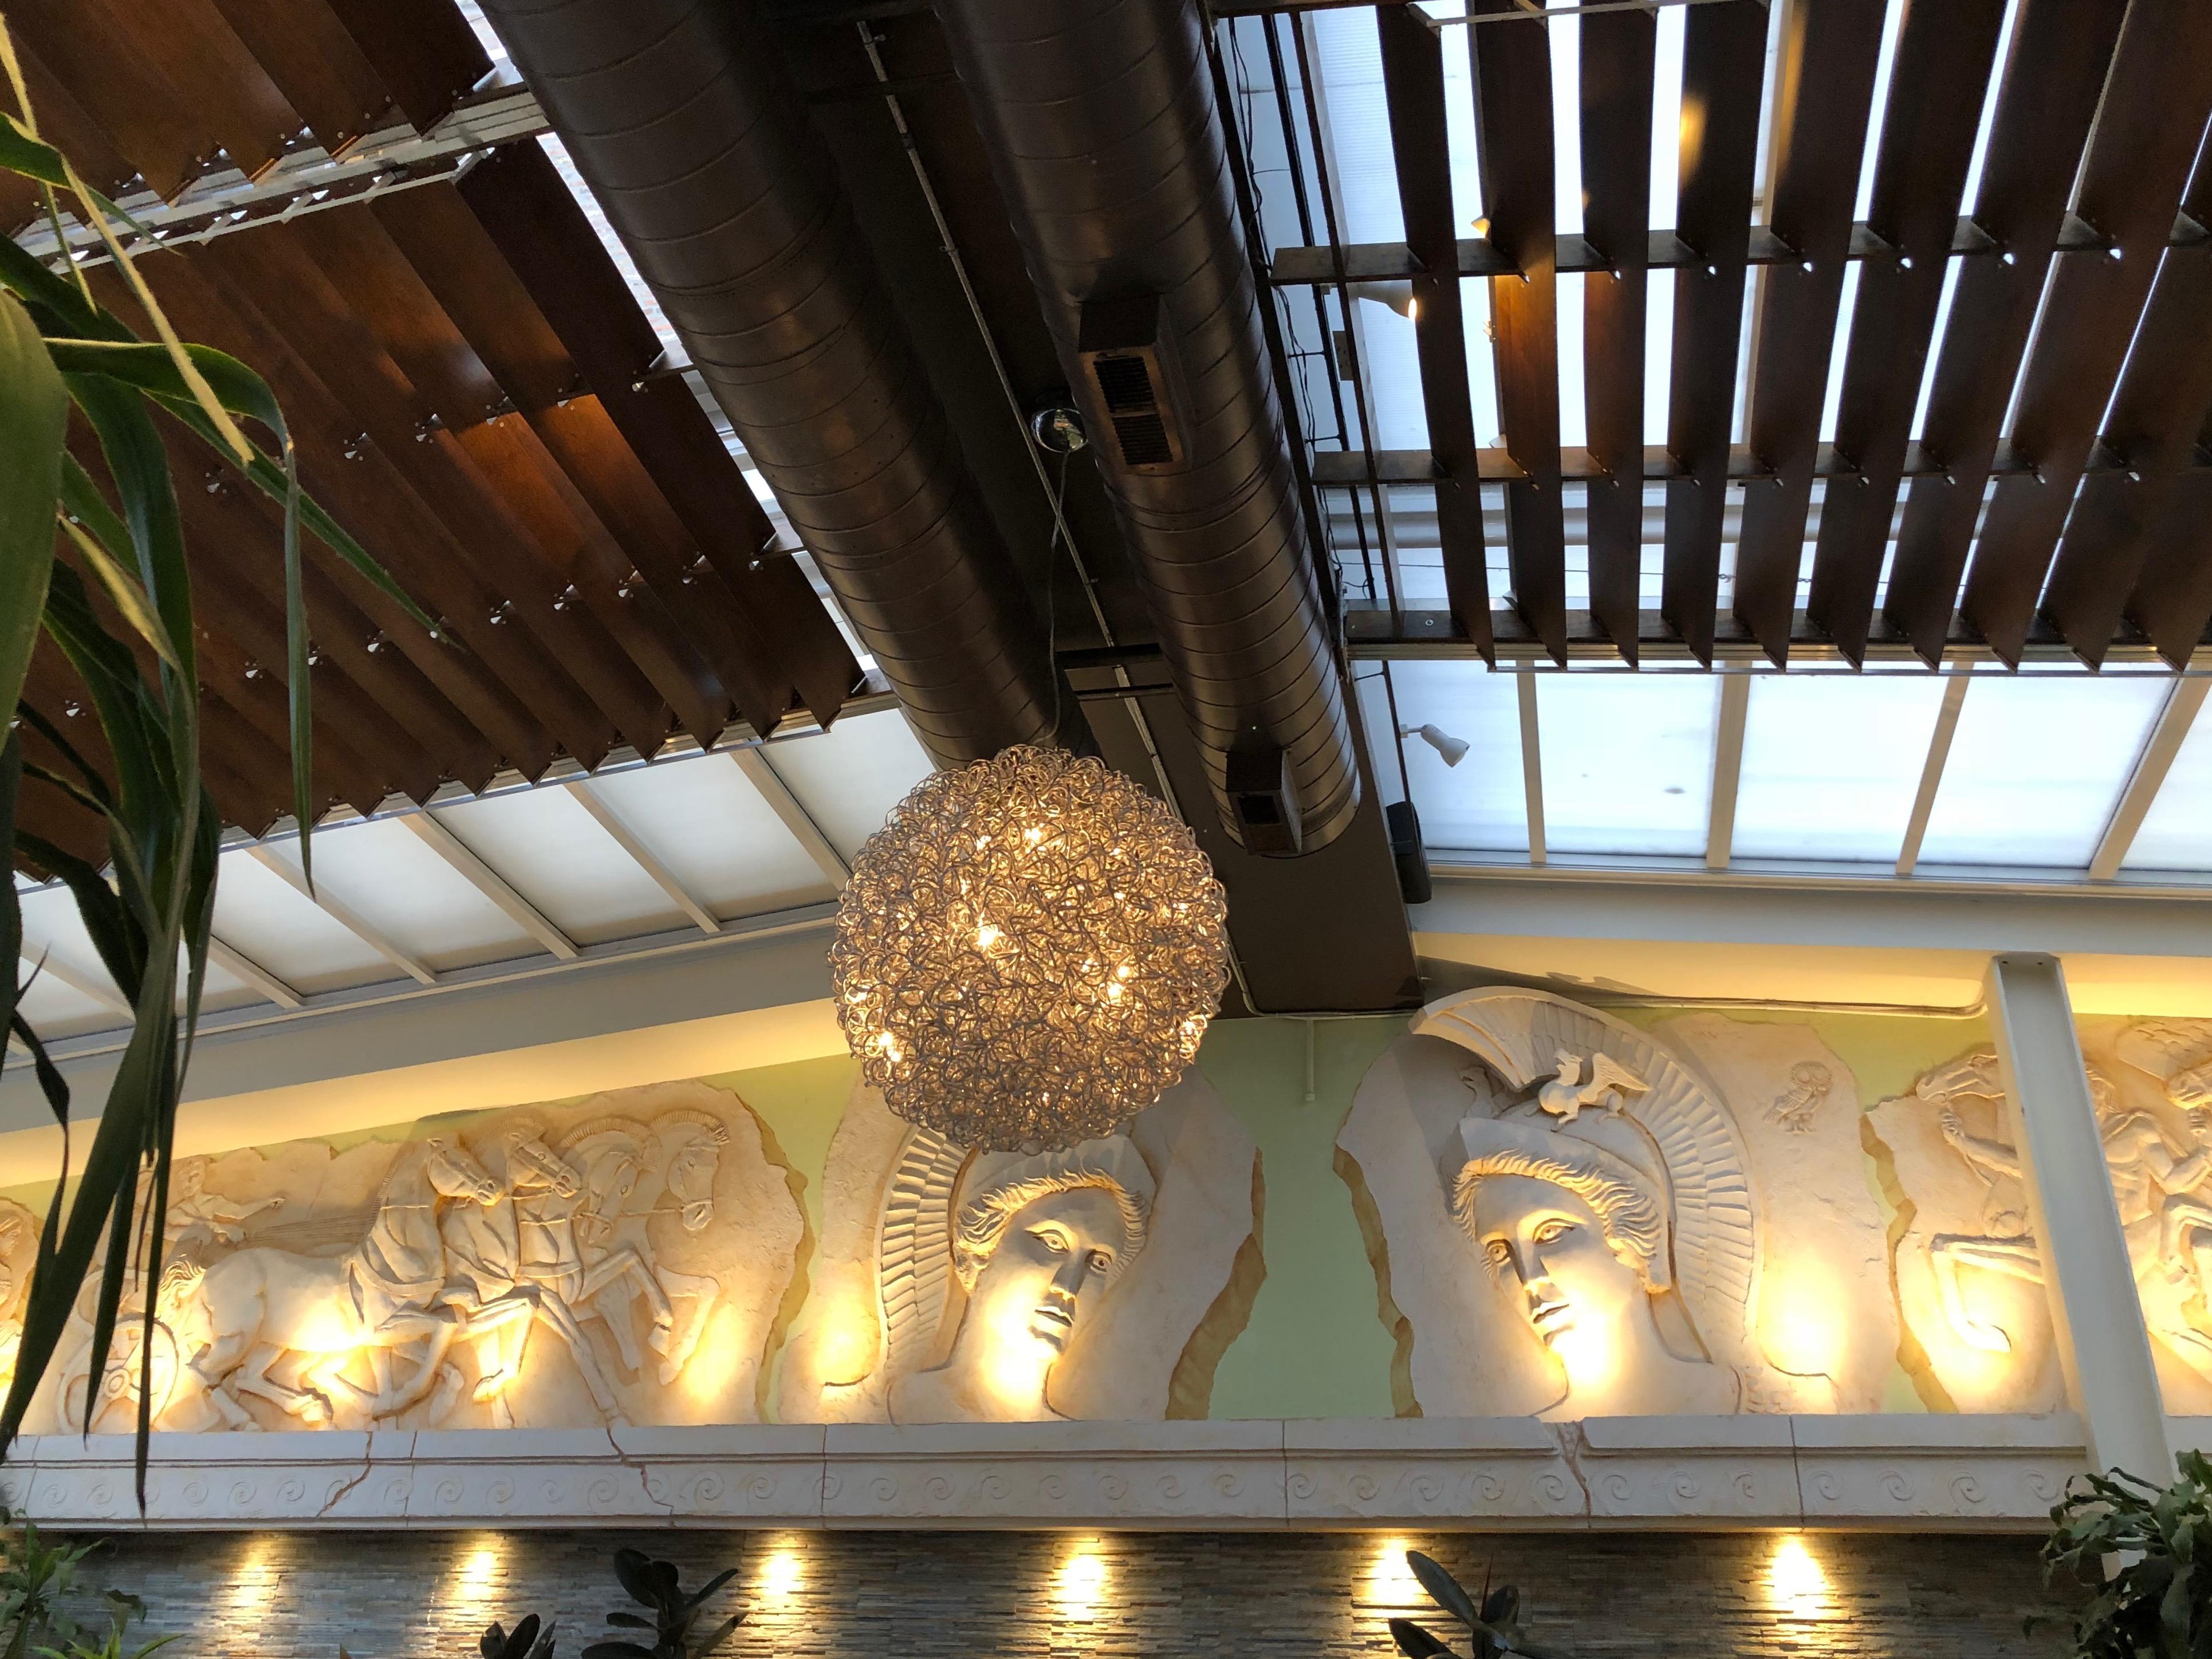 Interior, Athena Restaurant, Greektown, Chicago, Illinois